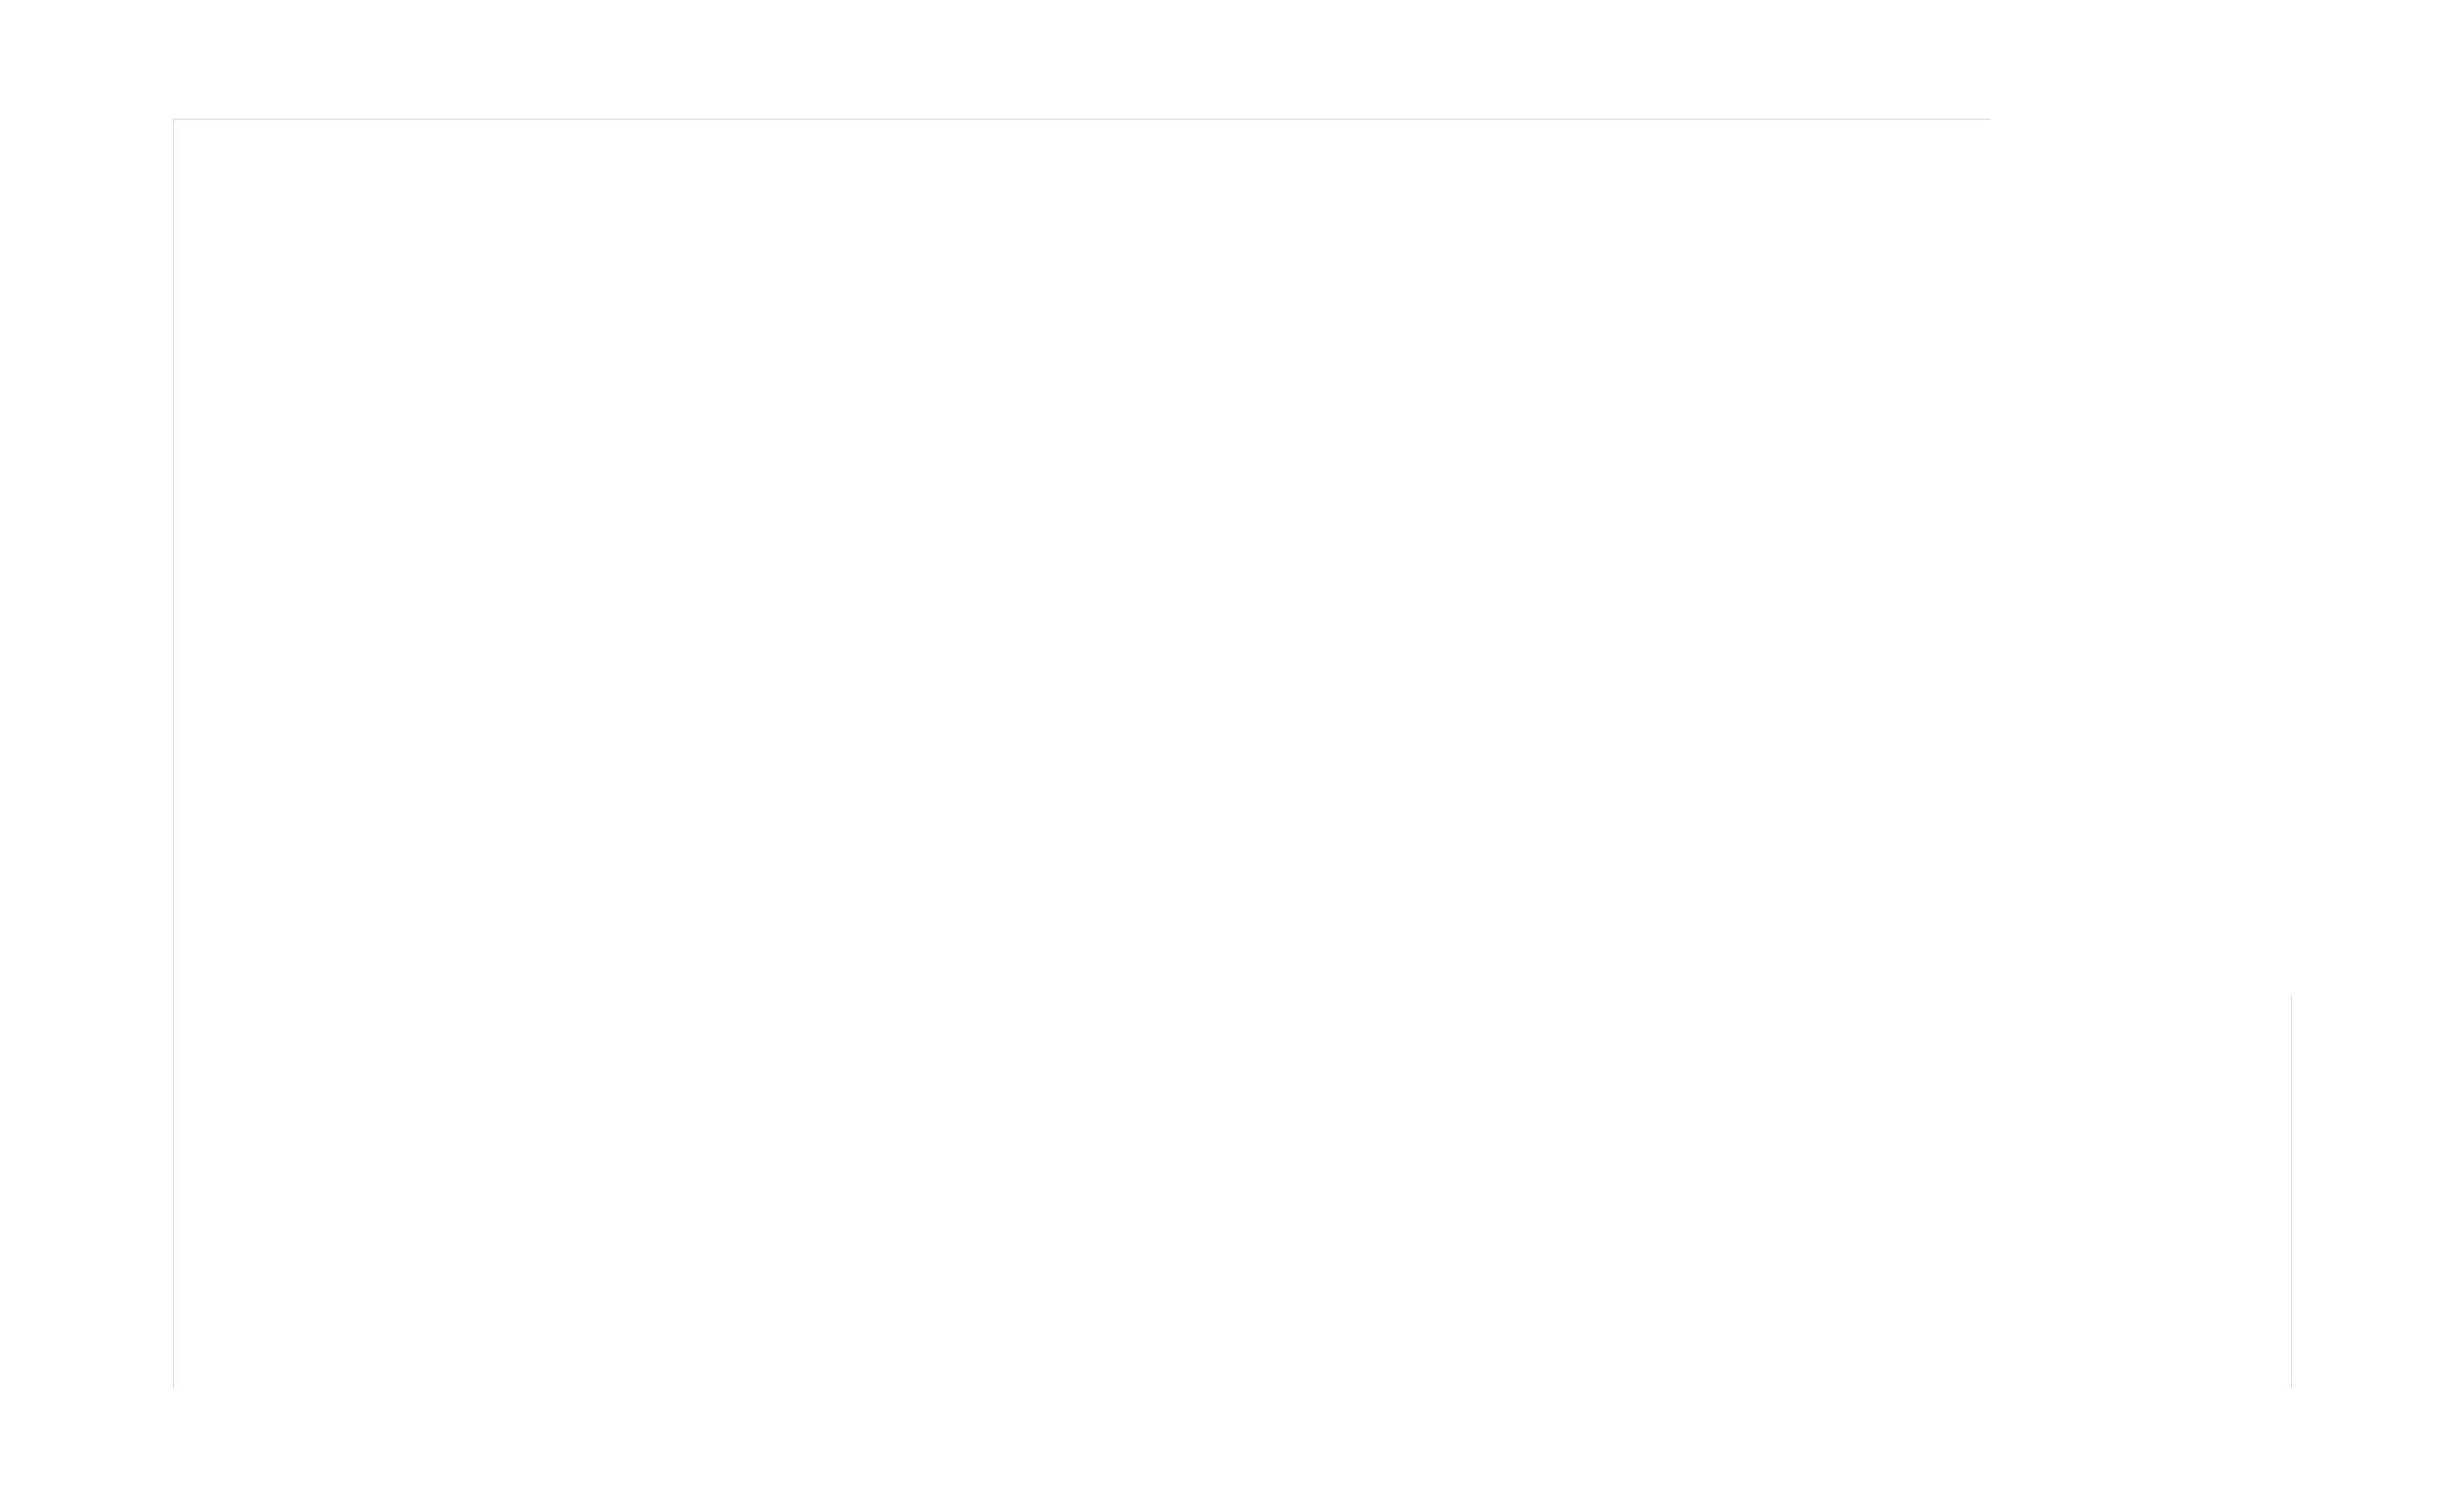 Mayhandmade – Khăn mặt tơ tằm, khẩu trang lụa, khẩu trang handmade, khẩu trang thêu tay